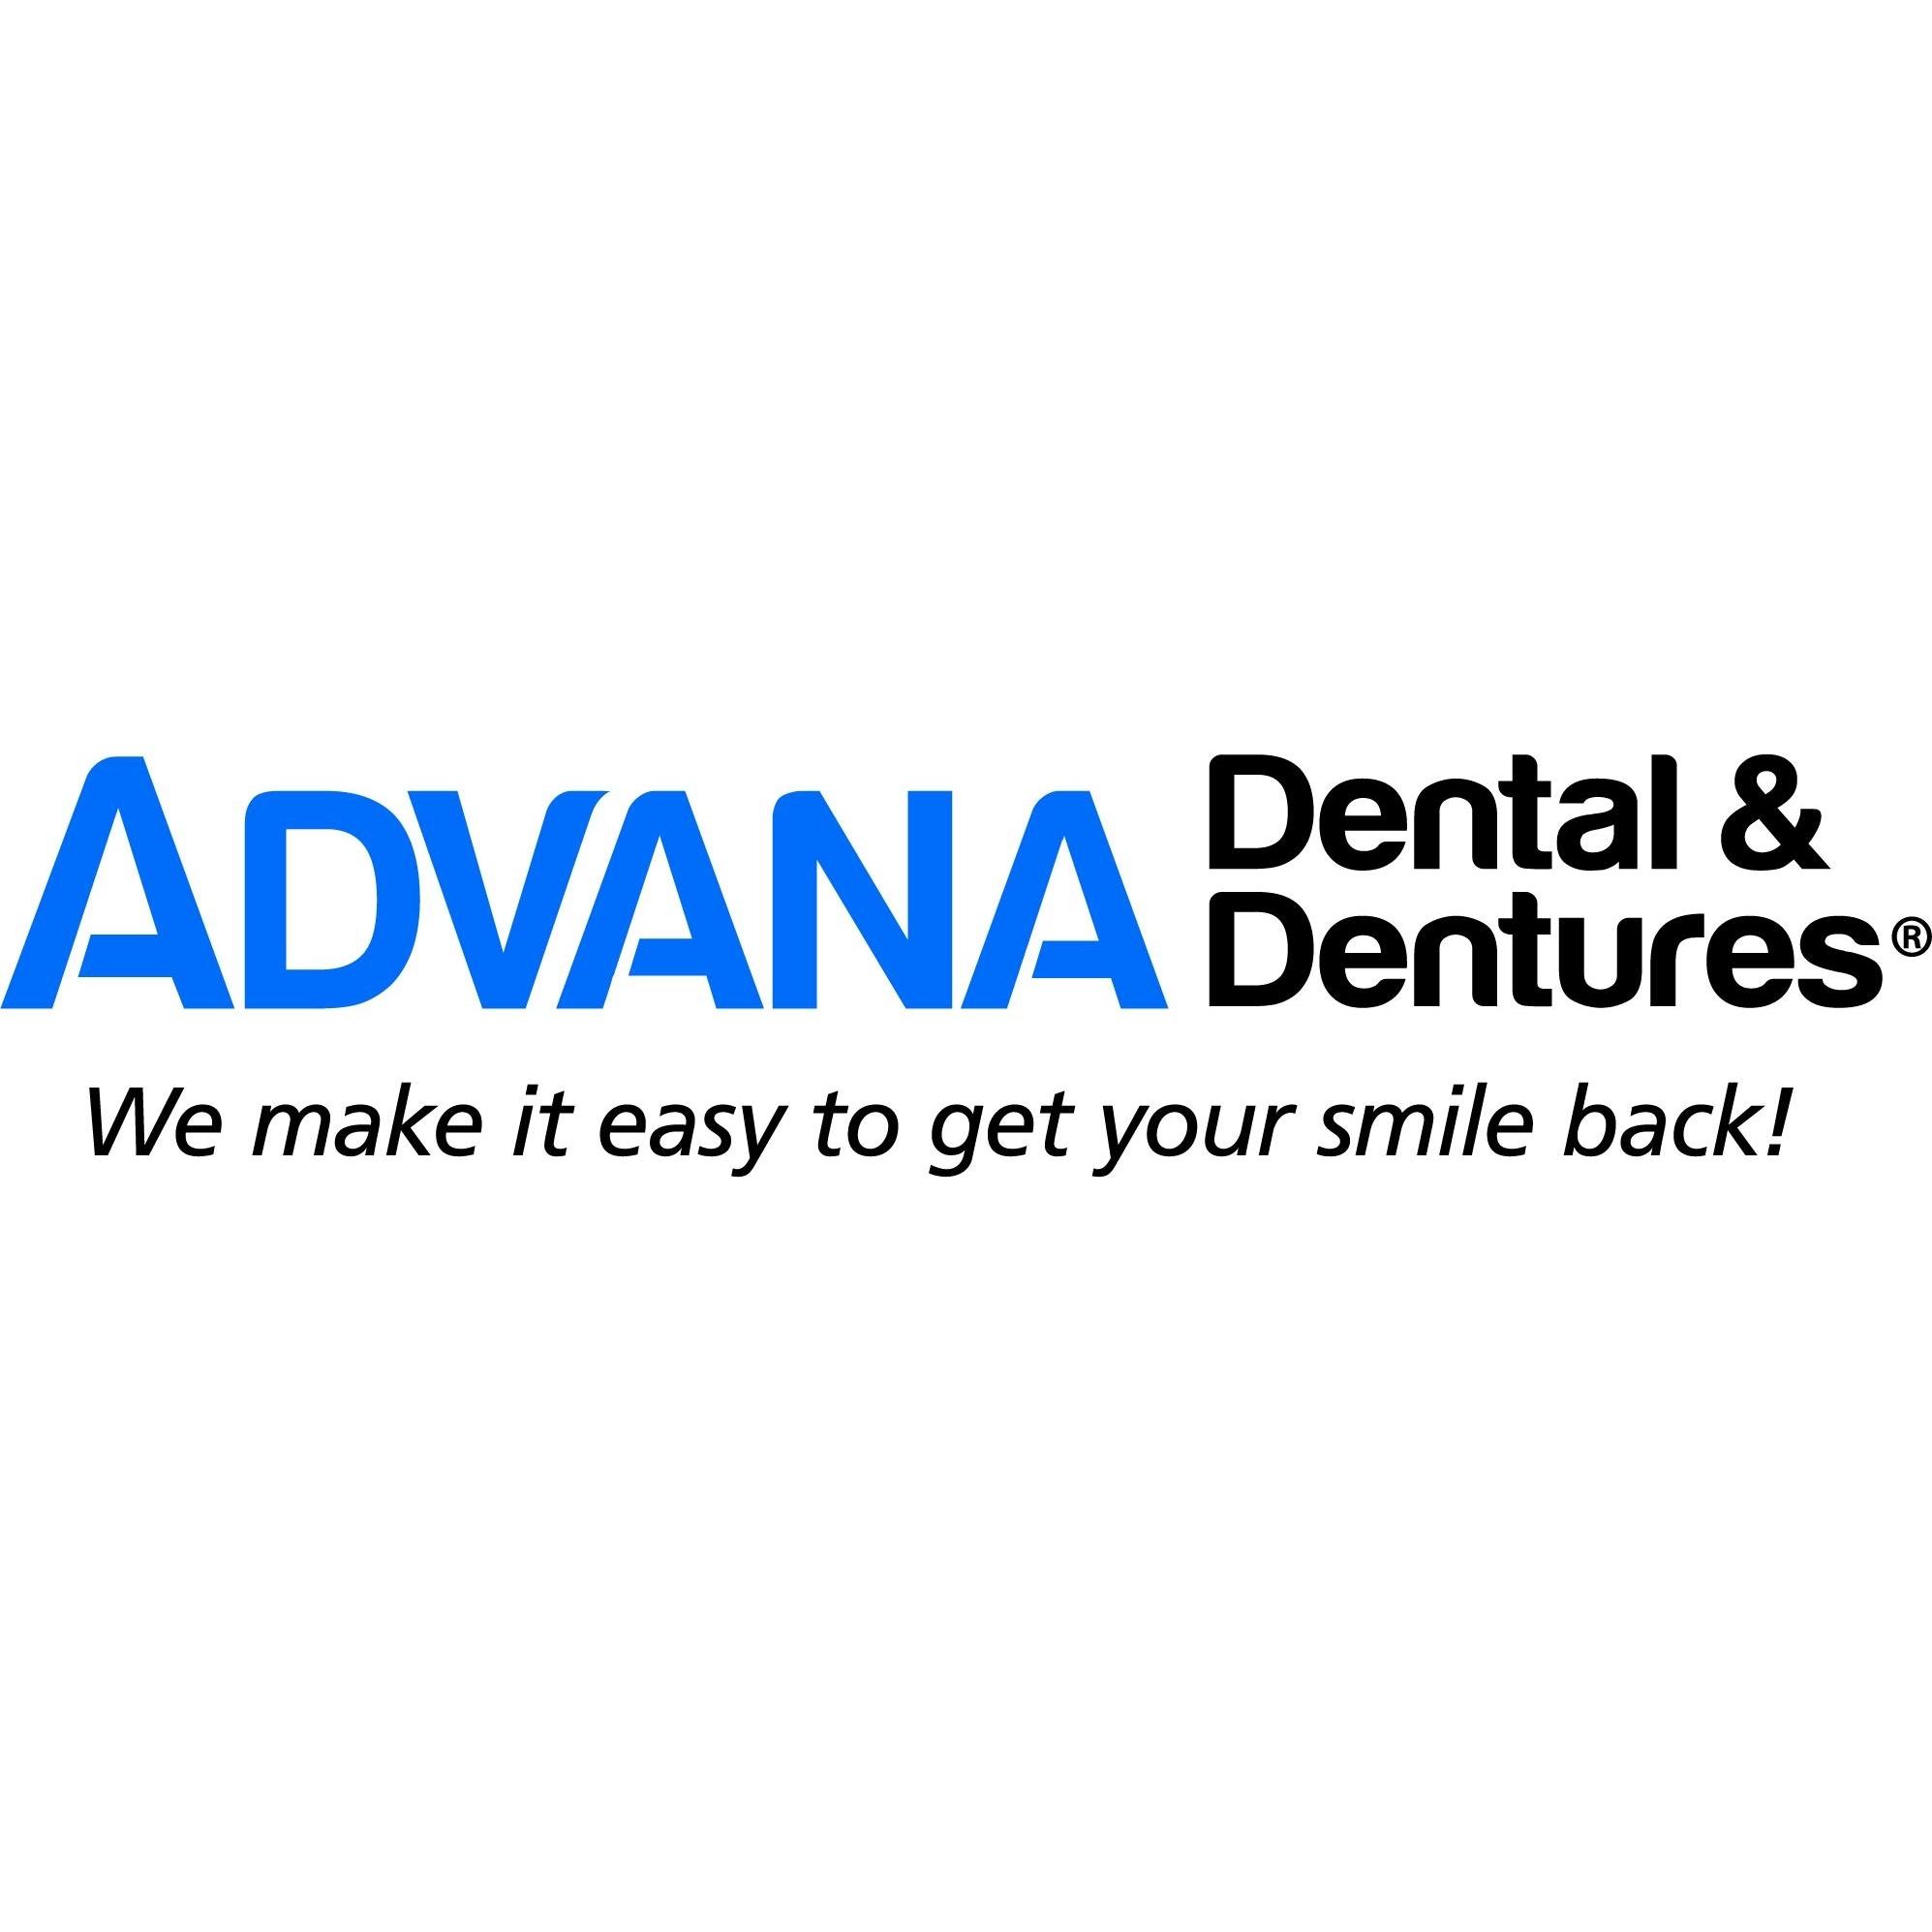 Advana Dental & Dentures